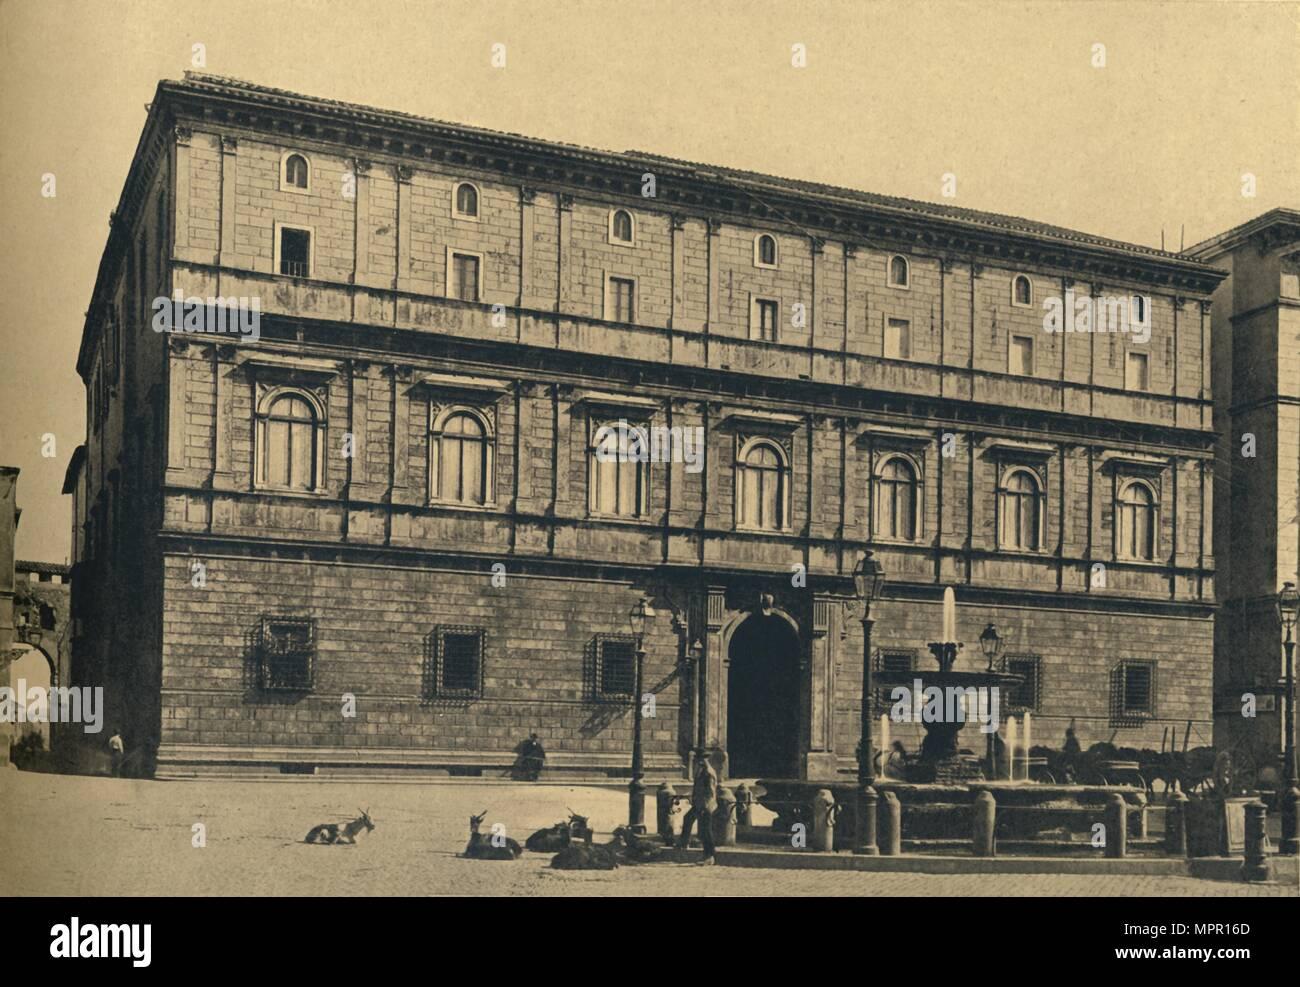 'Roma - Piazza Scossacavalli. - Palace of Prince Torlonia, by Bramante', 1910. Artist: Unknown. - Stock Image